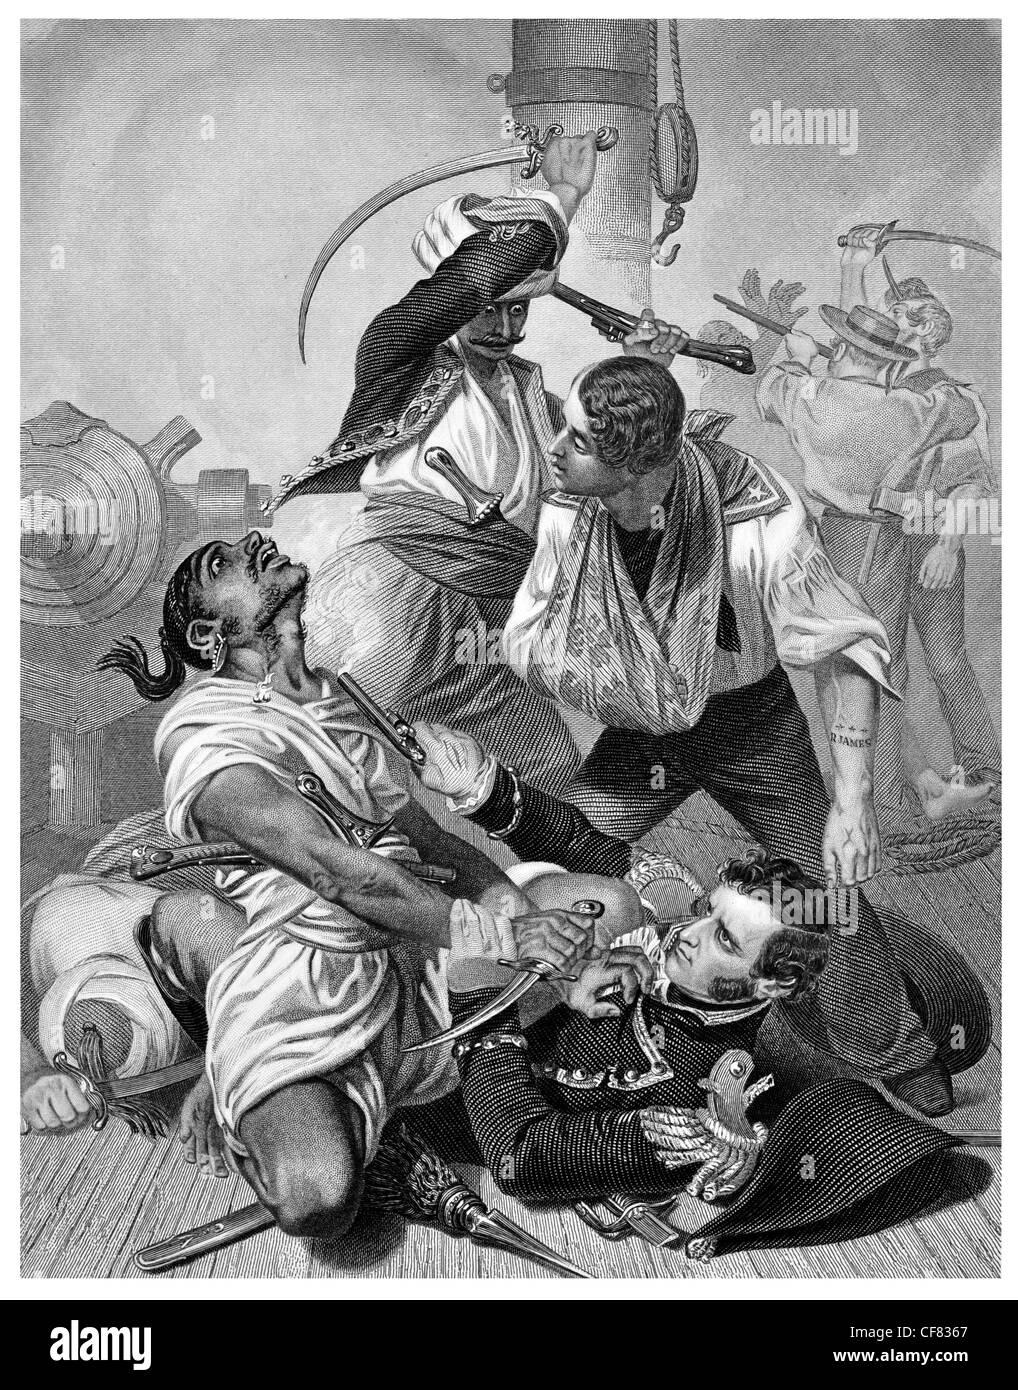 barbary pirates thesis